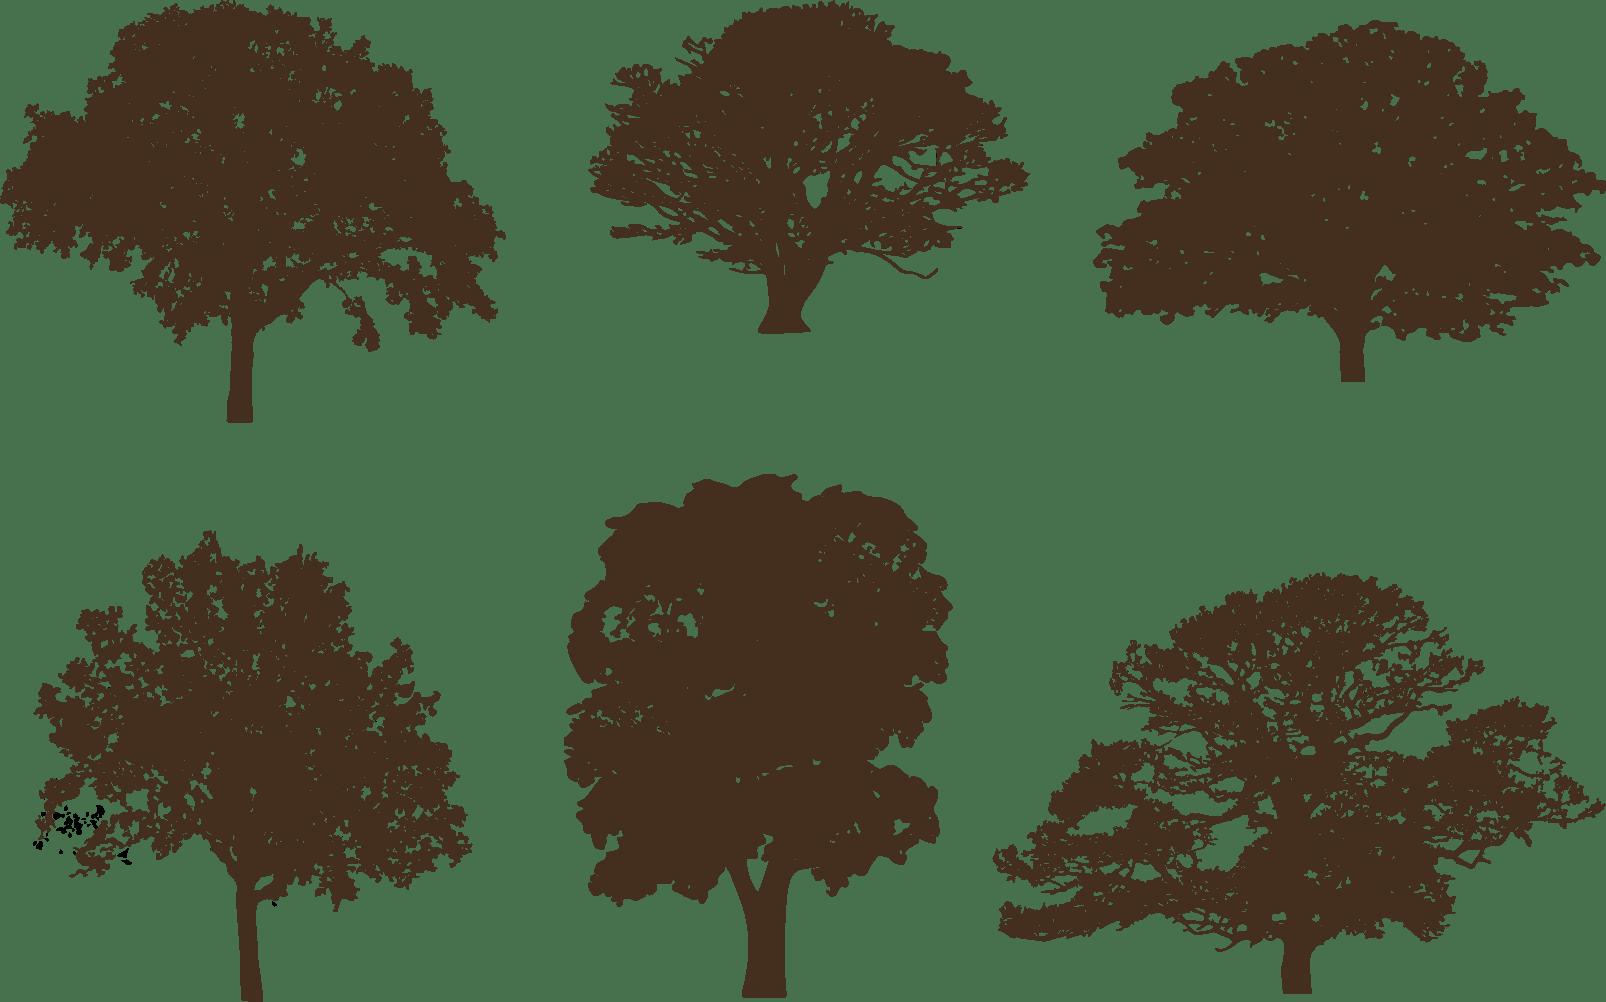 Oak Tree Silhouettes Download Free Vector Art Stock